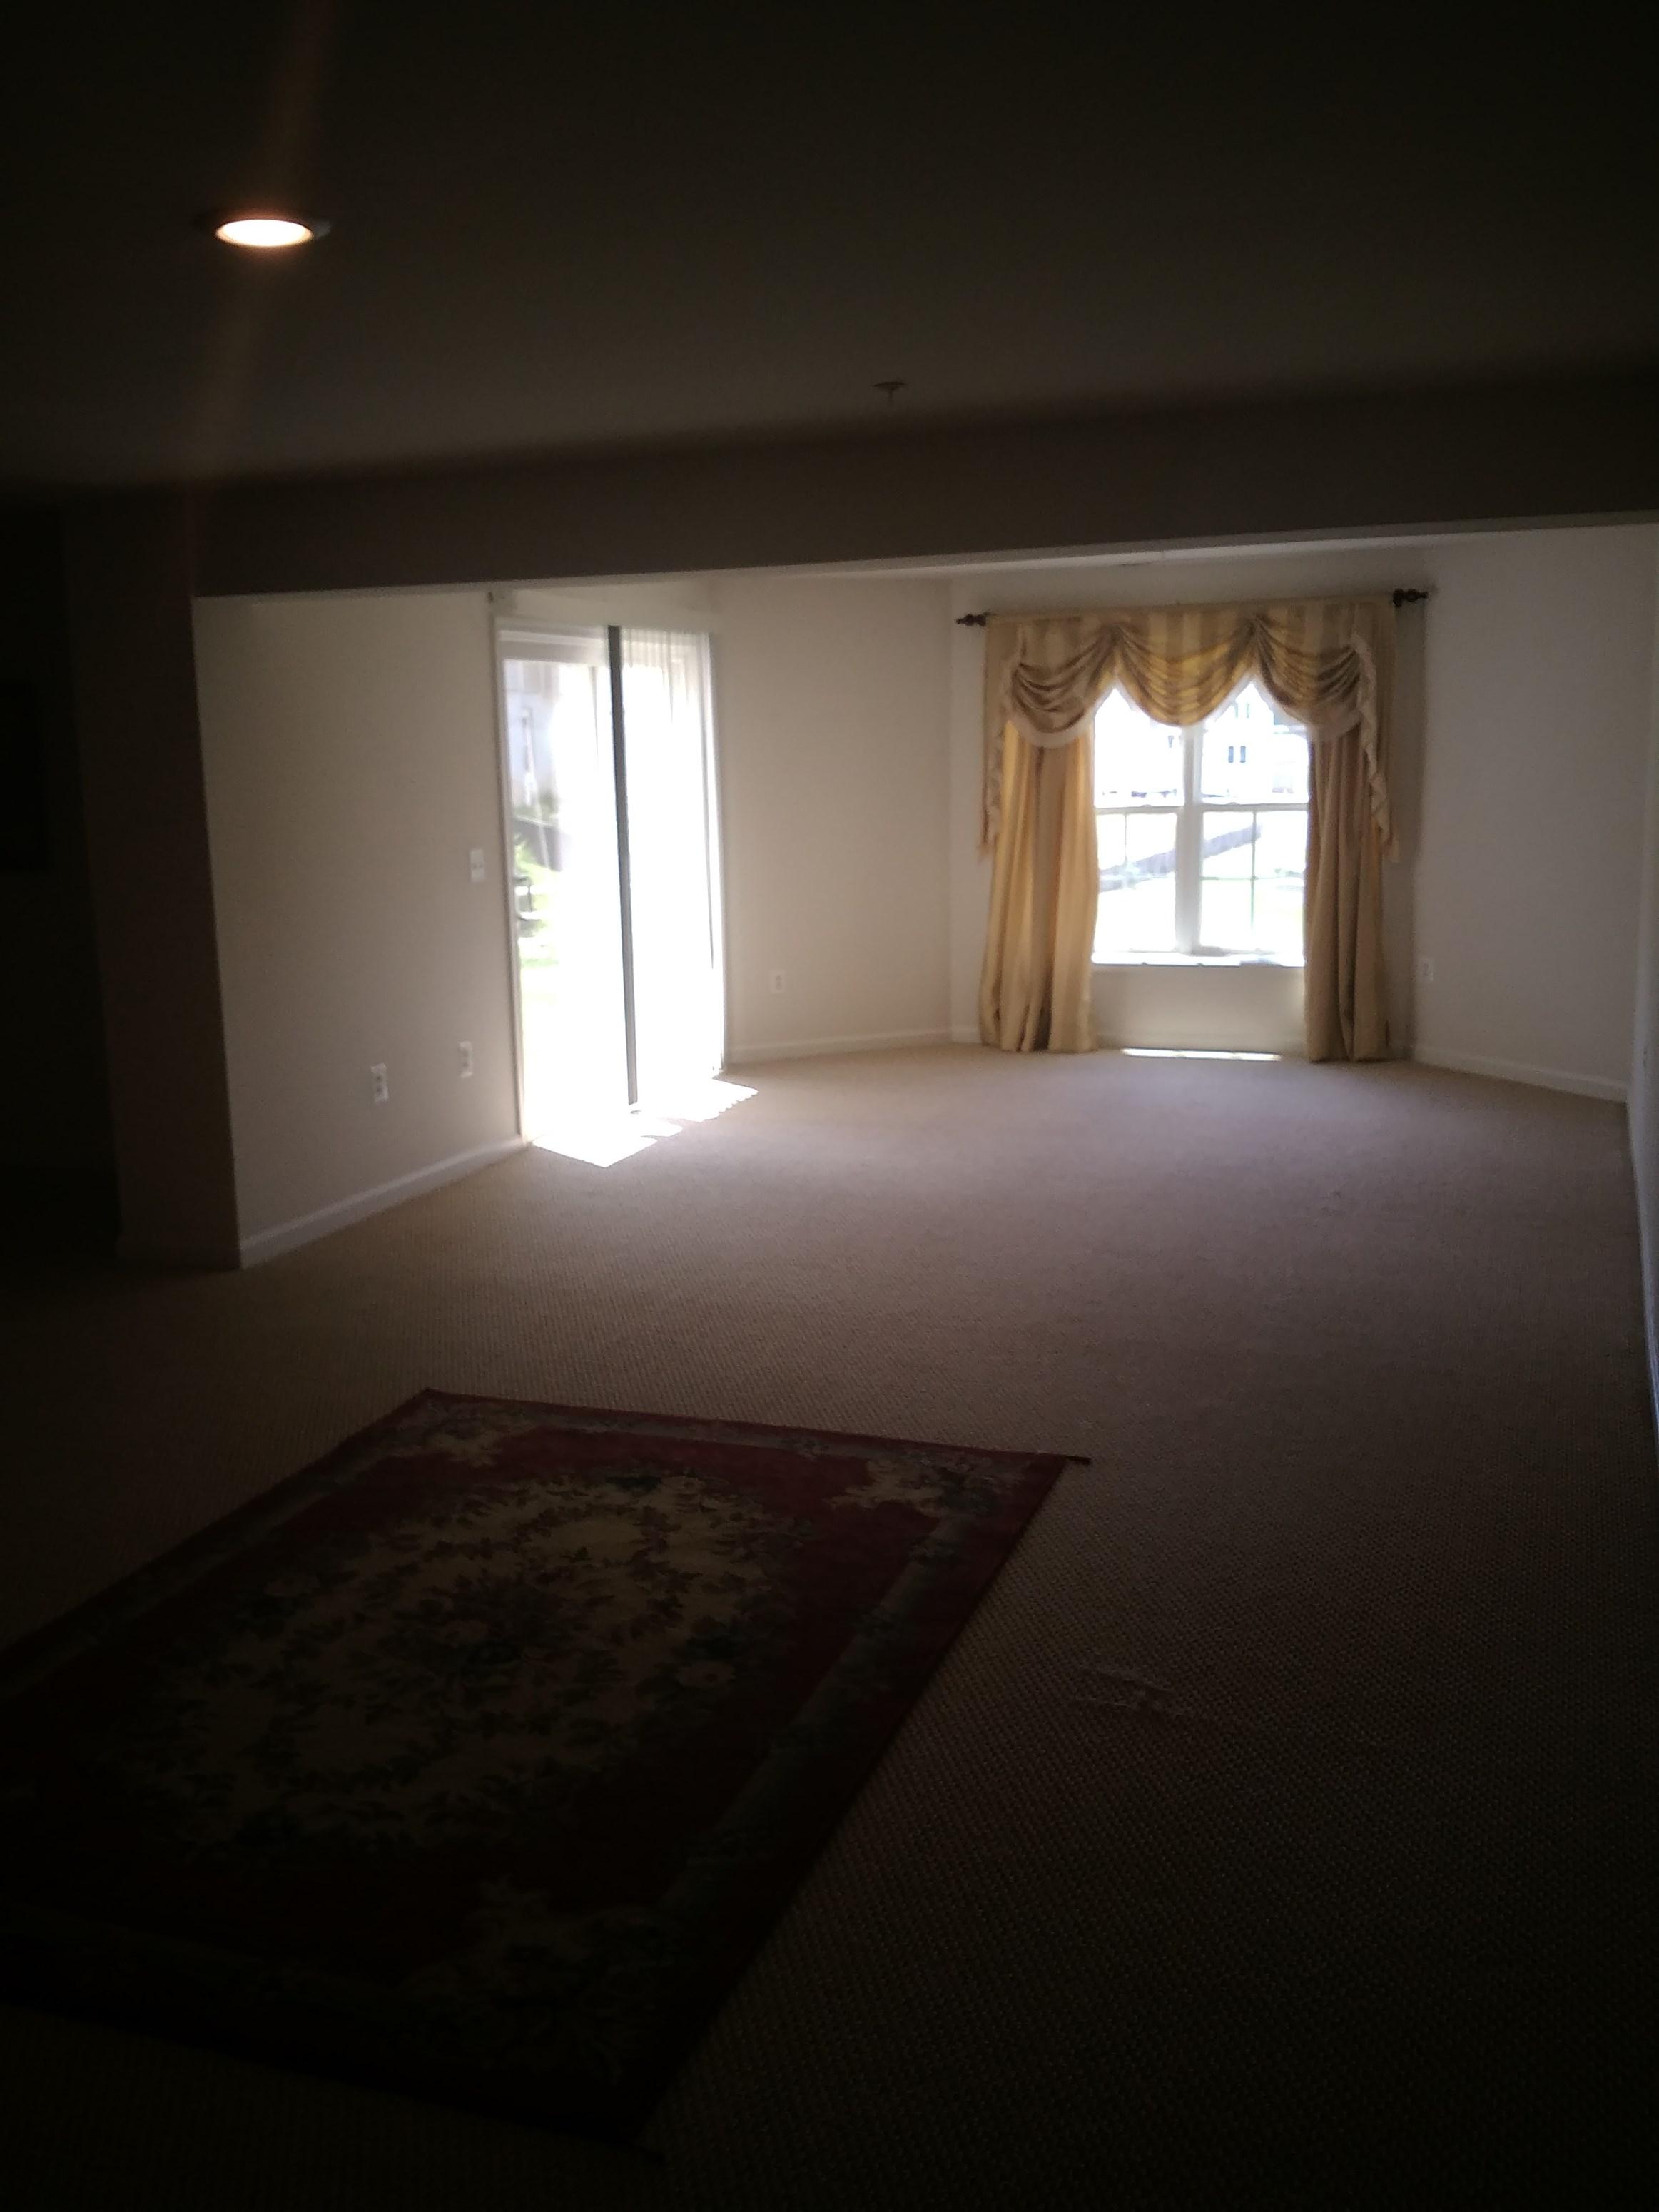 Basement Room For Rent